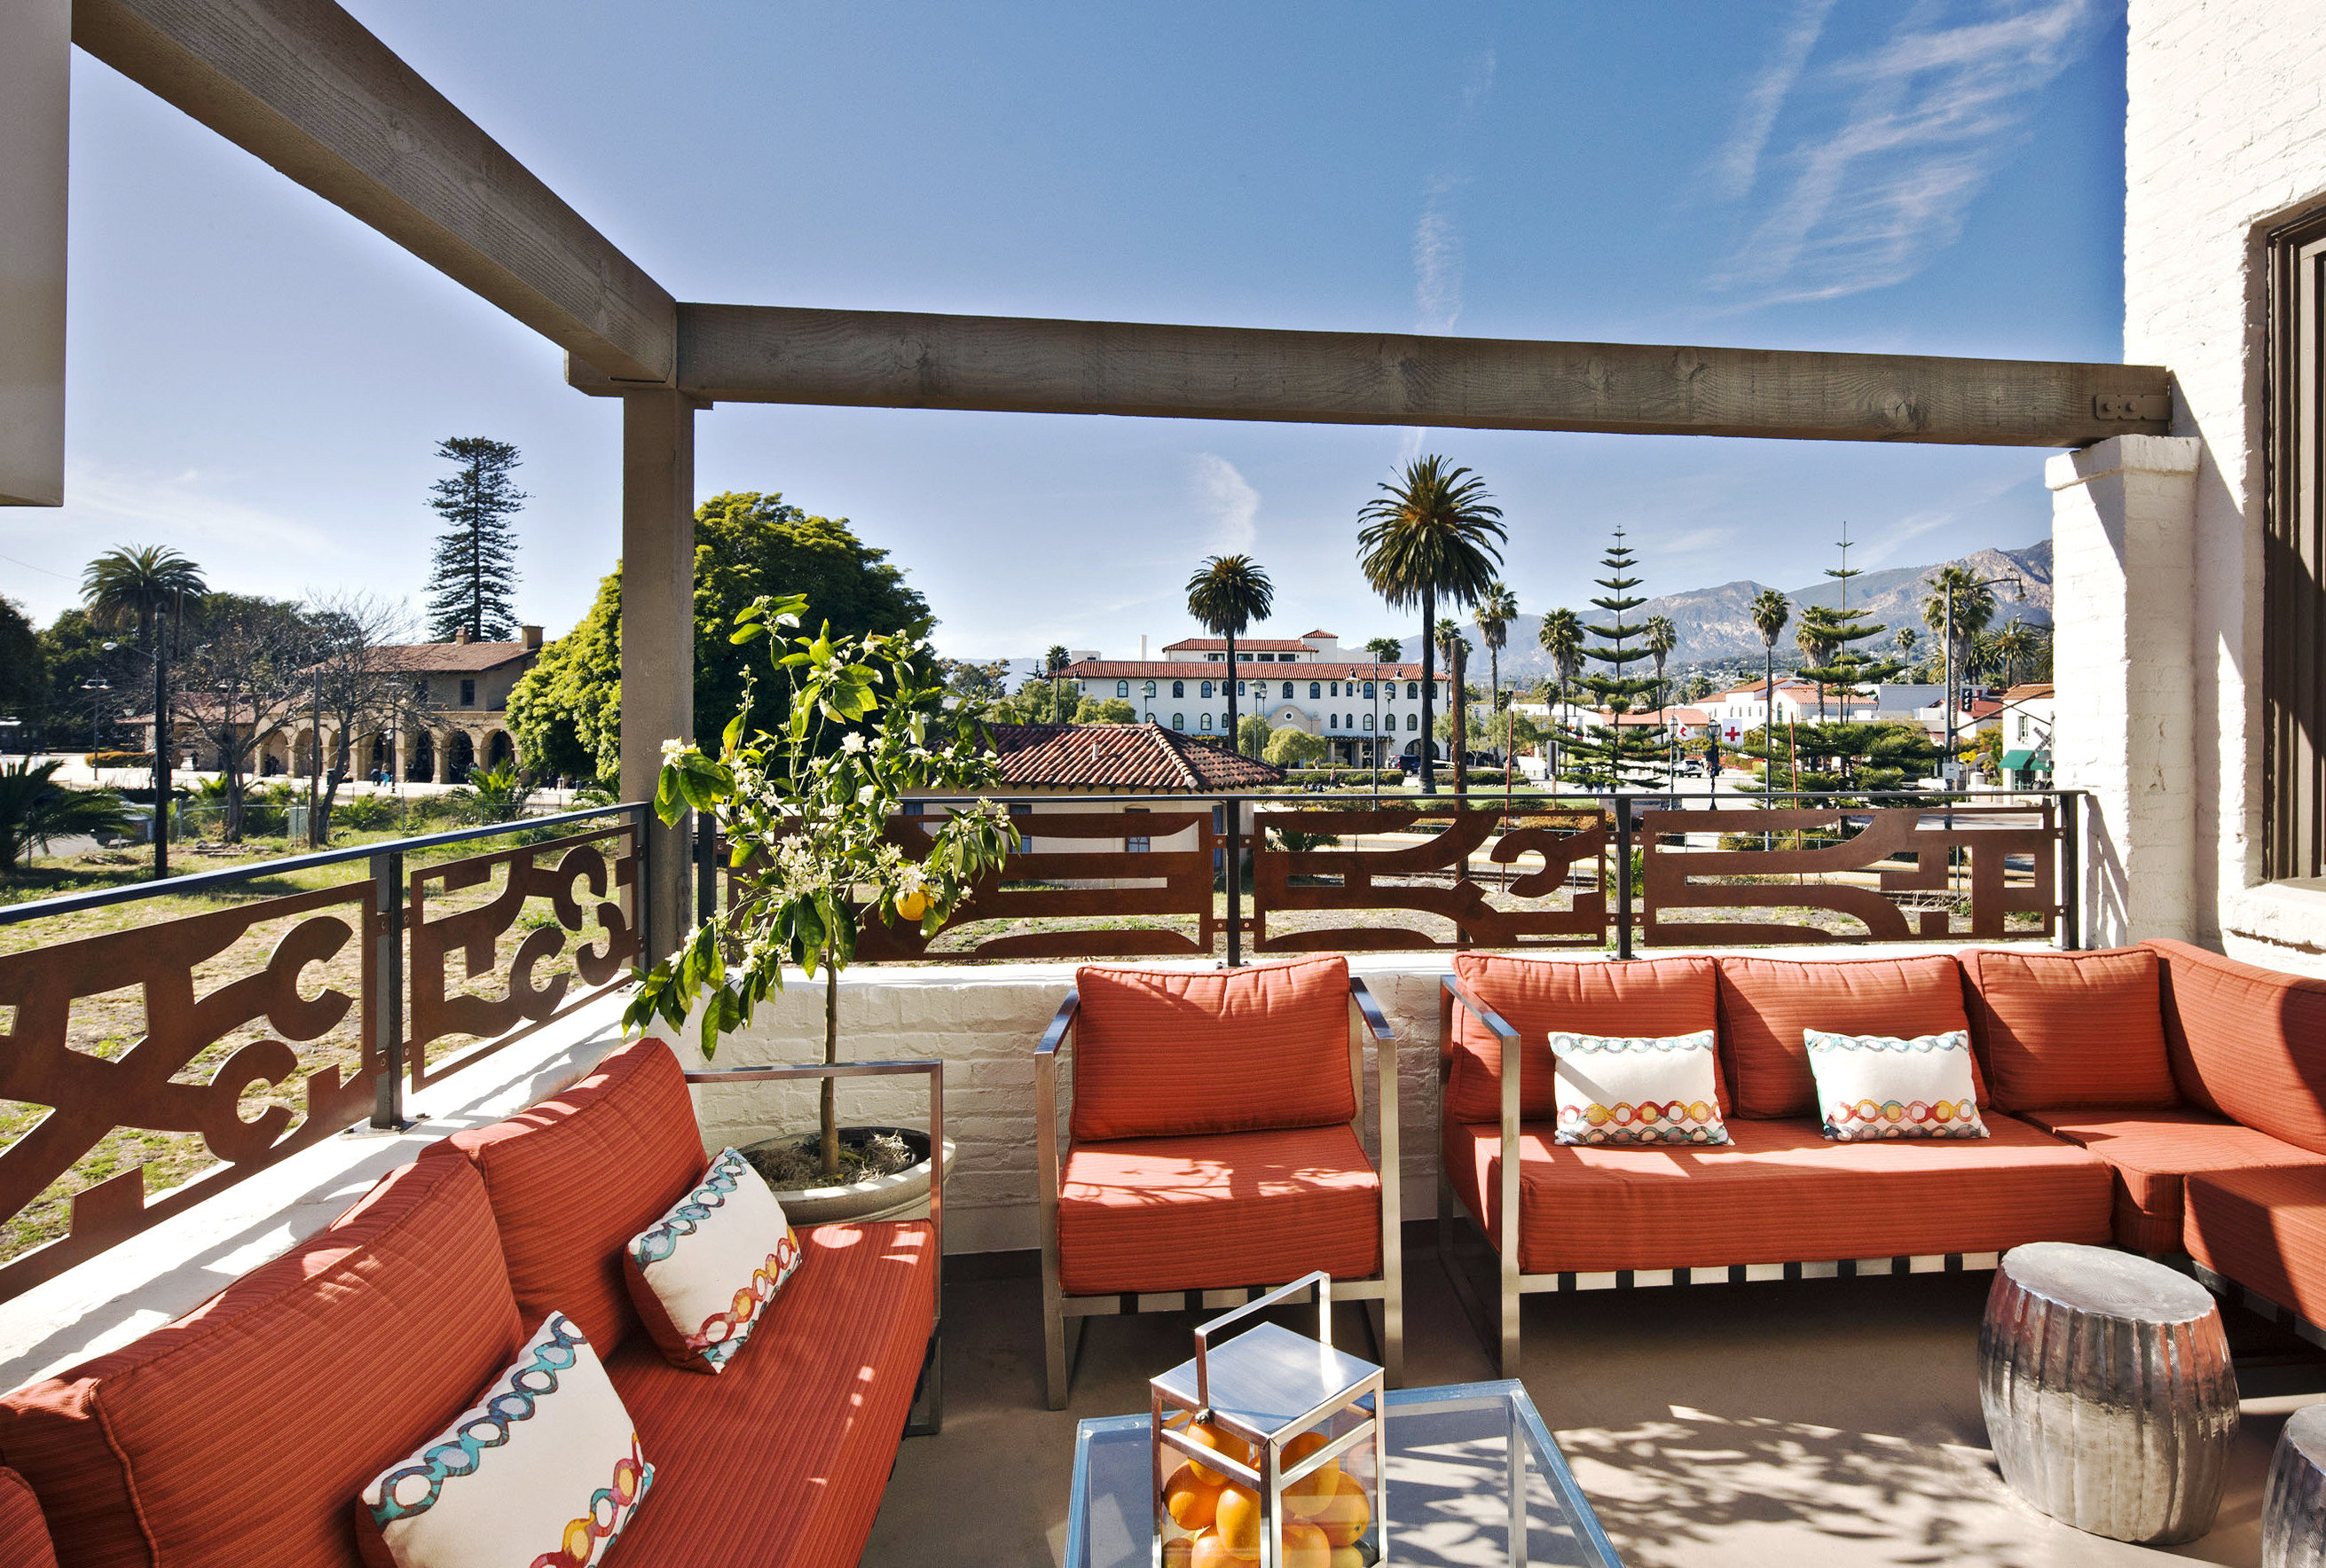 Deck Eco Hip Lounge Modern Patio Terrace sky property chair home Resort restaurant Villa hacienda cottage